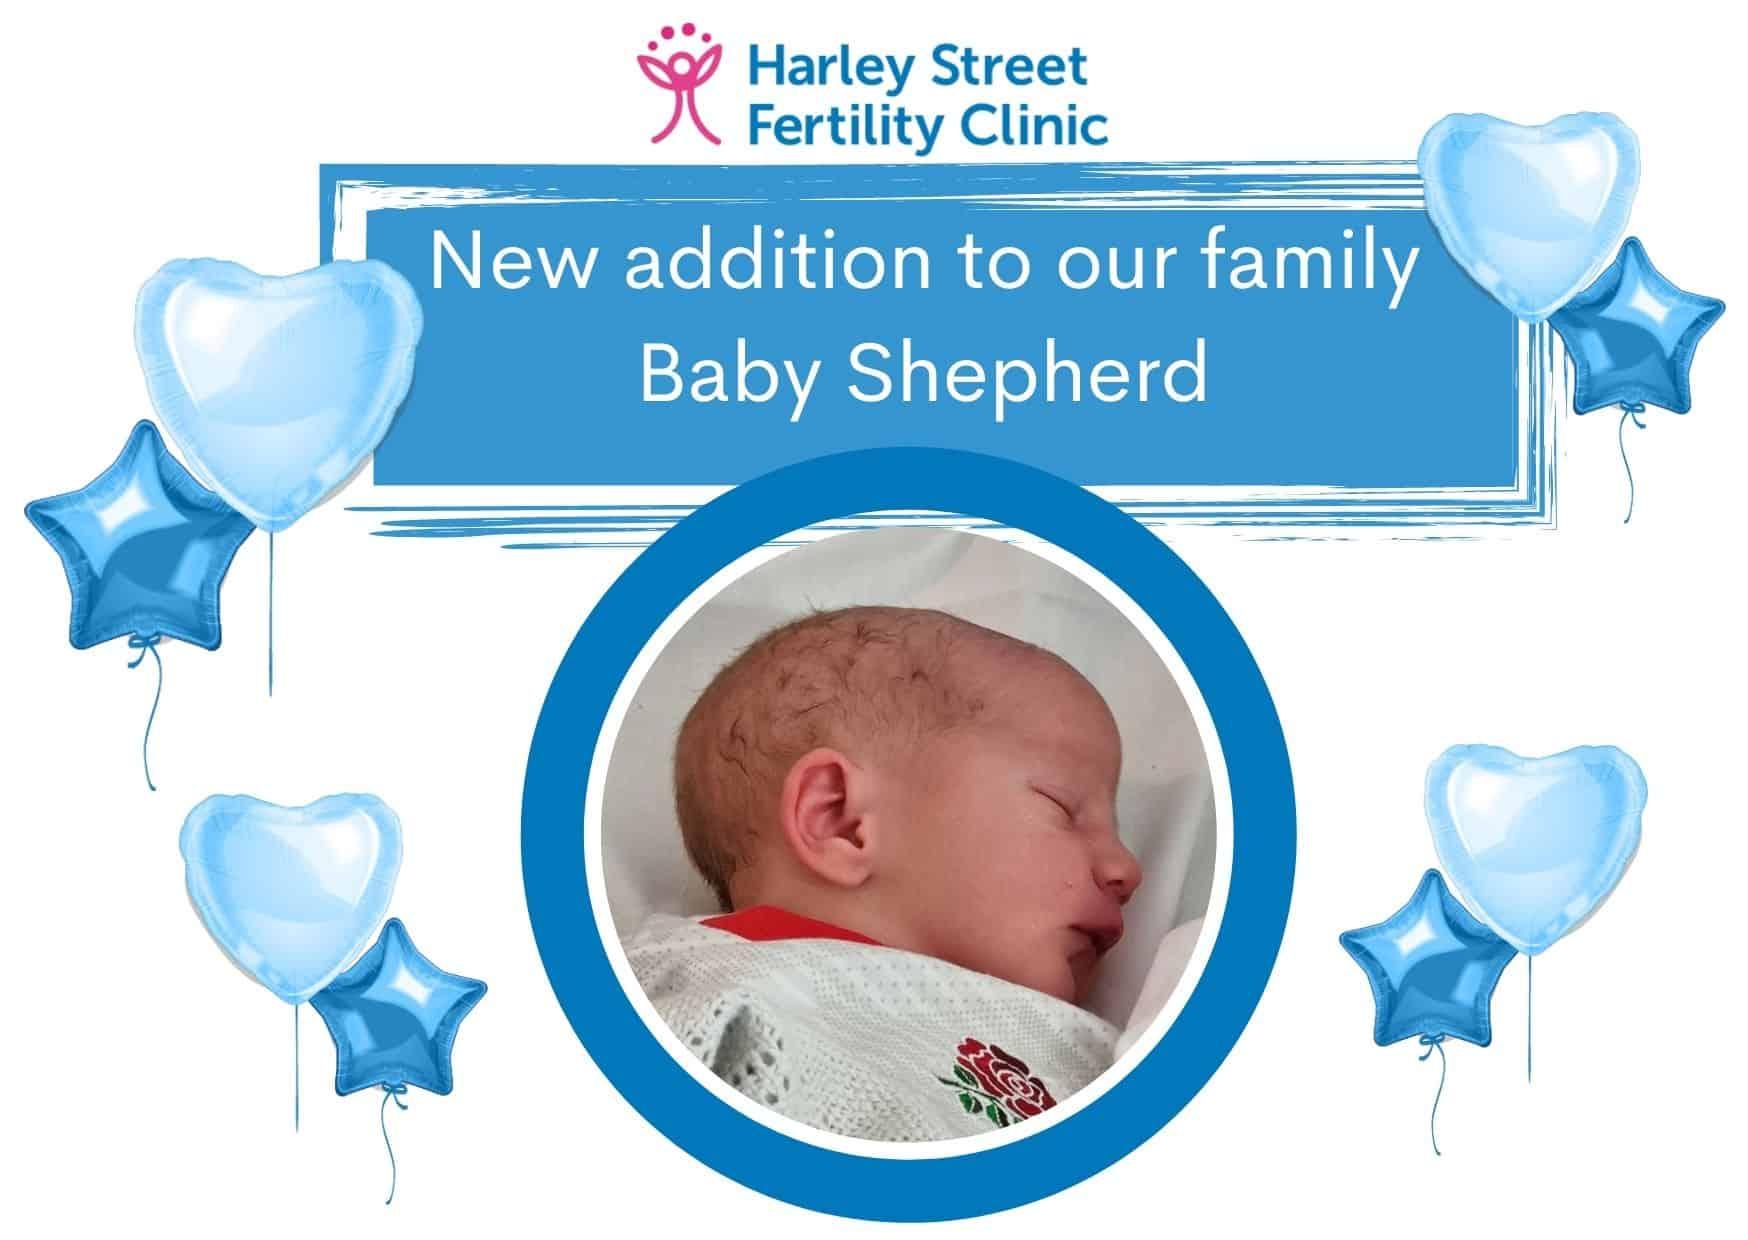 Thank you, Harley Street Fertility Clinic!